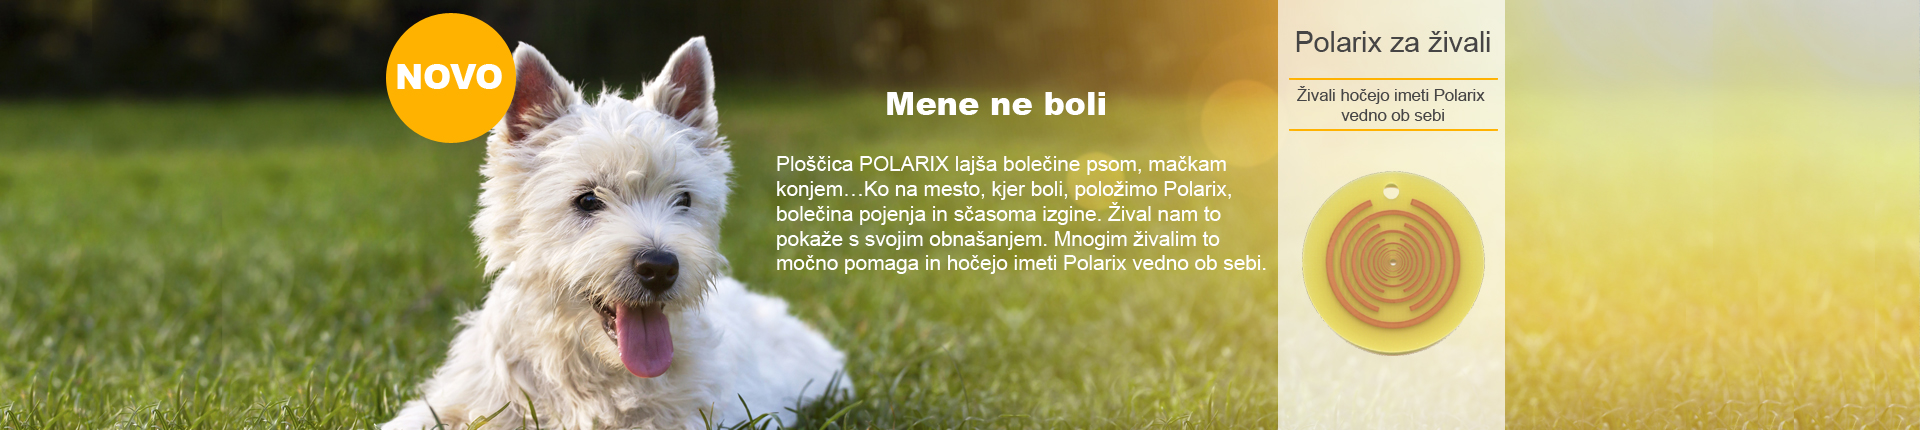 Polarix_za_zivali